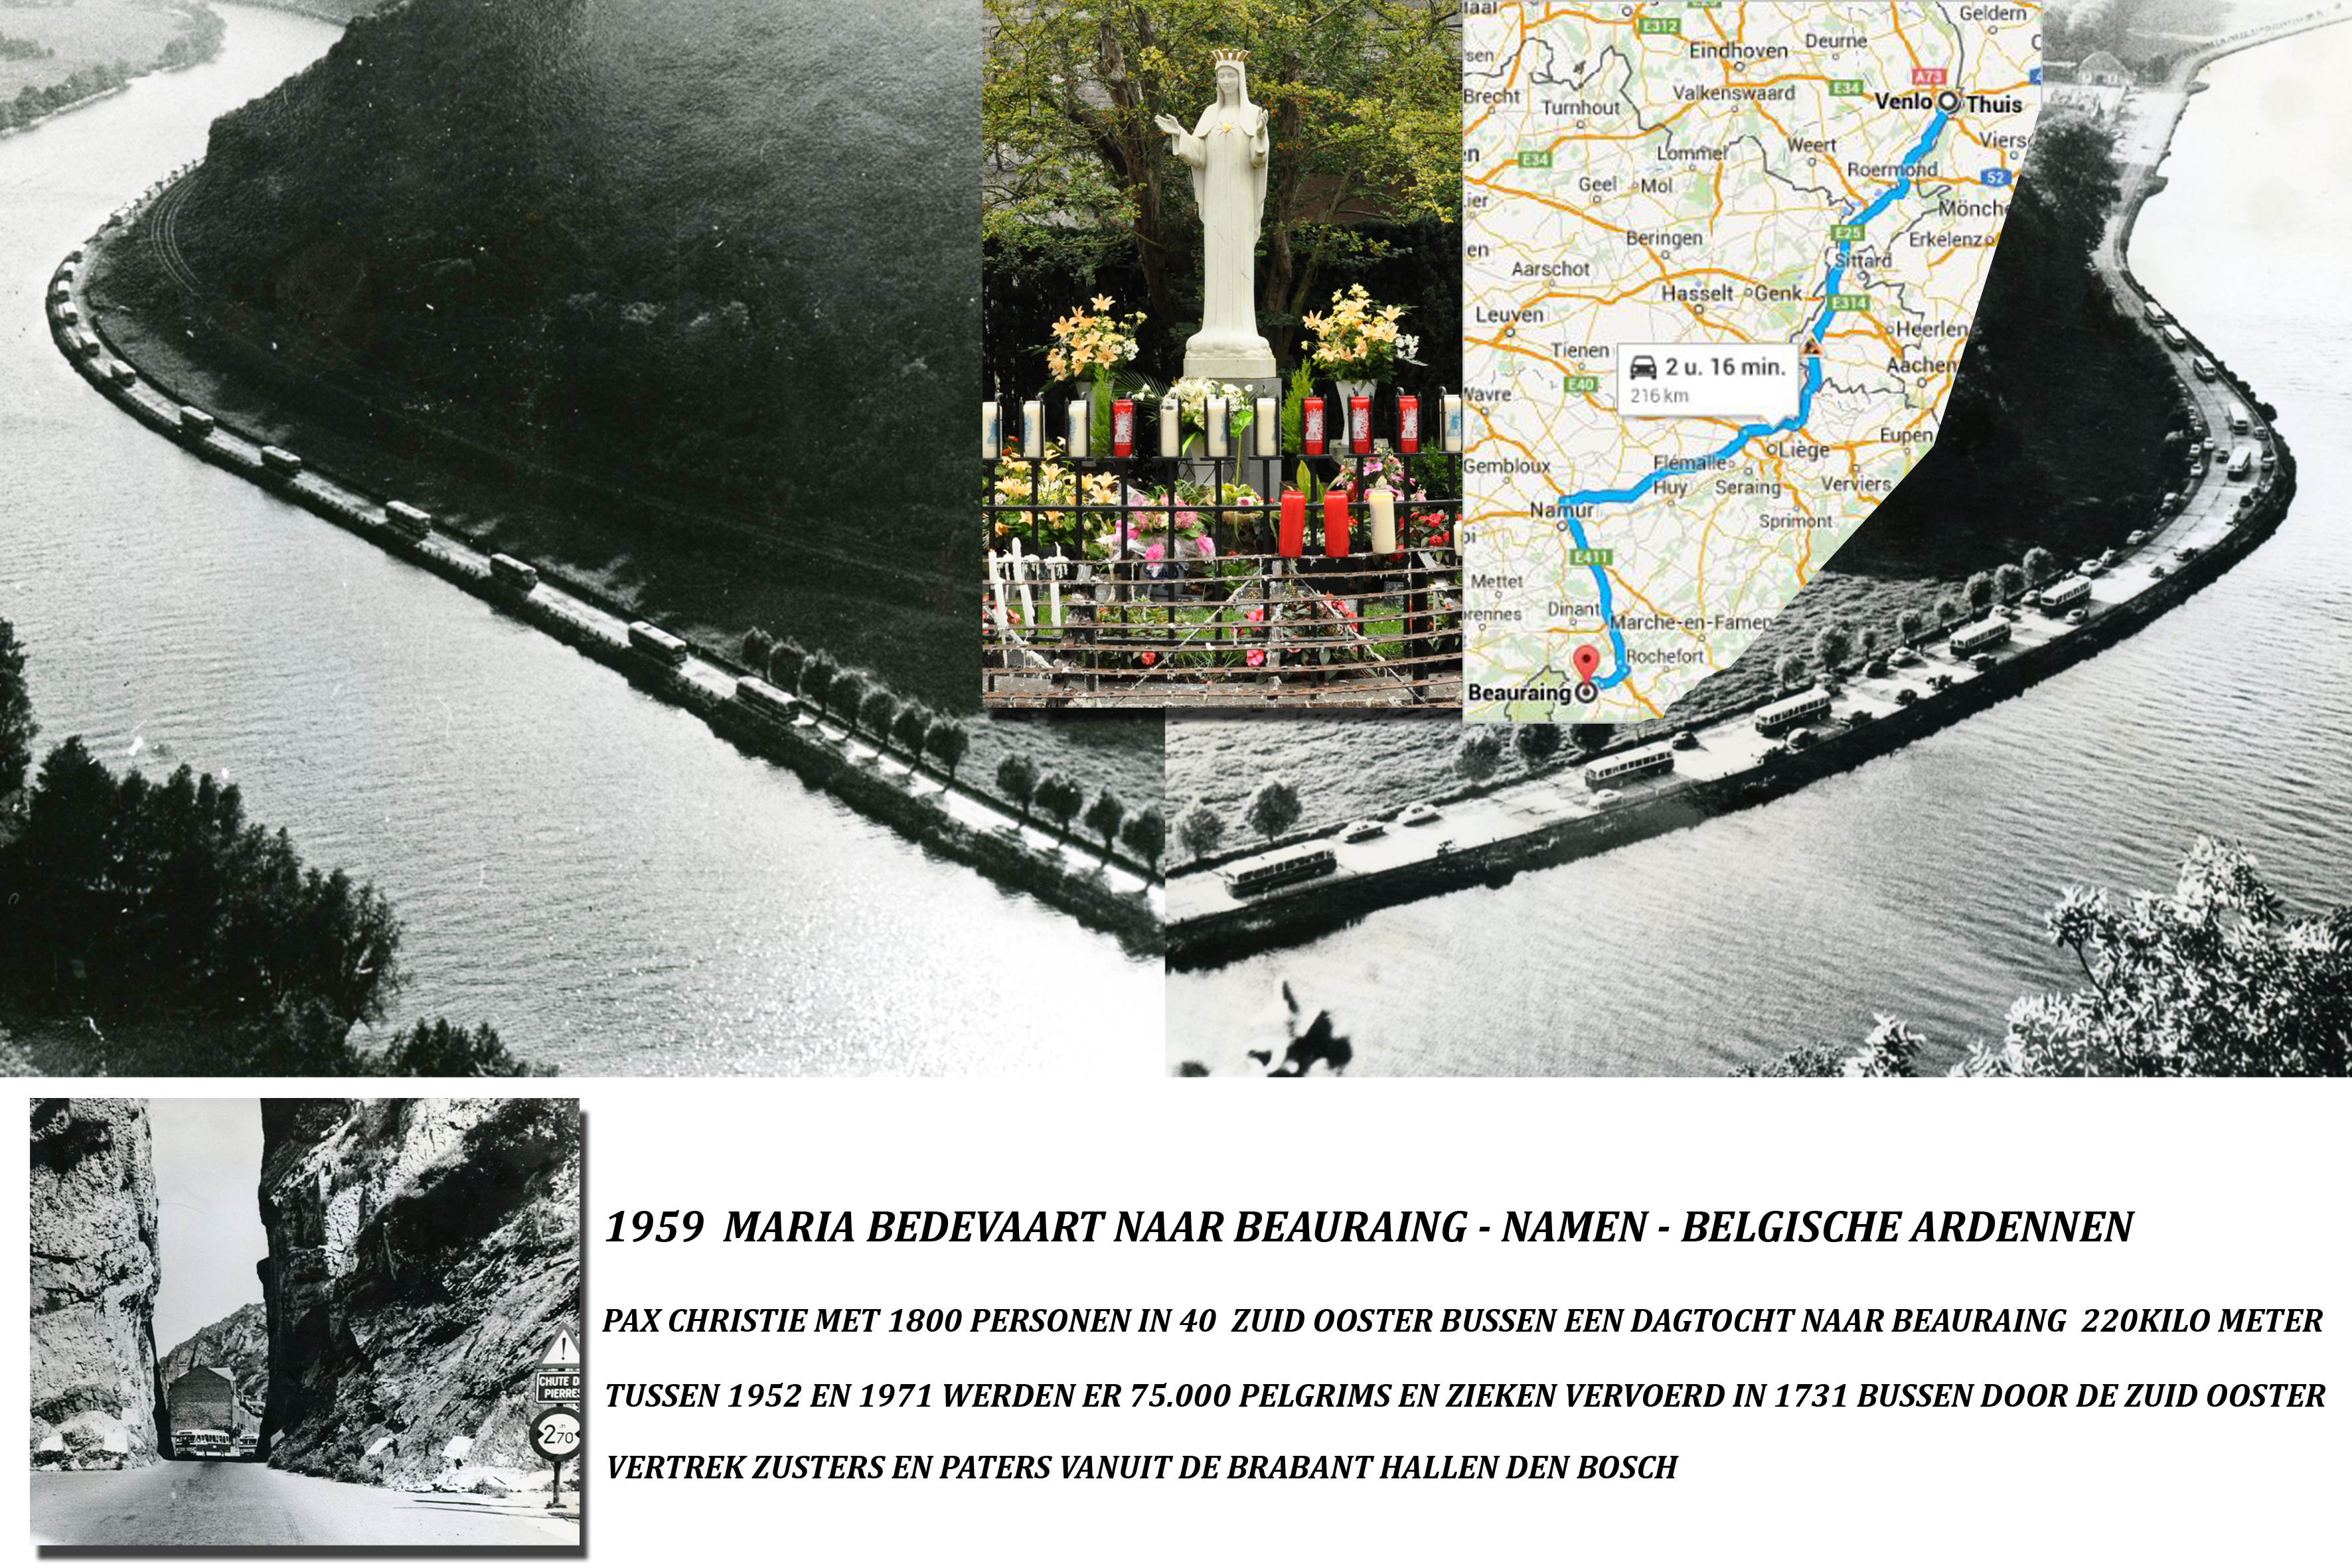 Maria-bedevaart-Beauring-Banneux-(1)